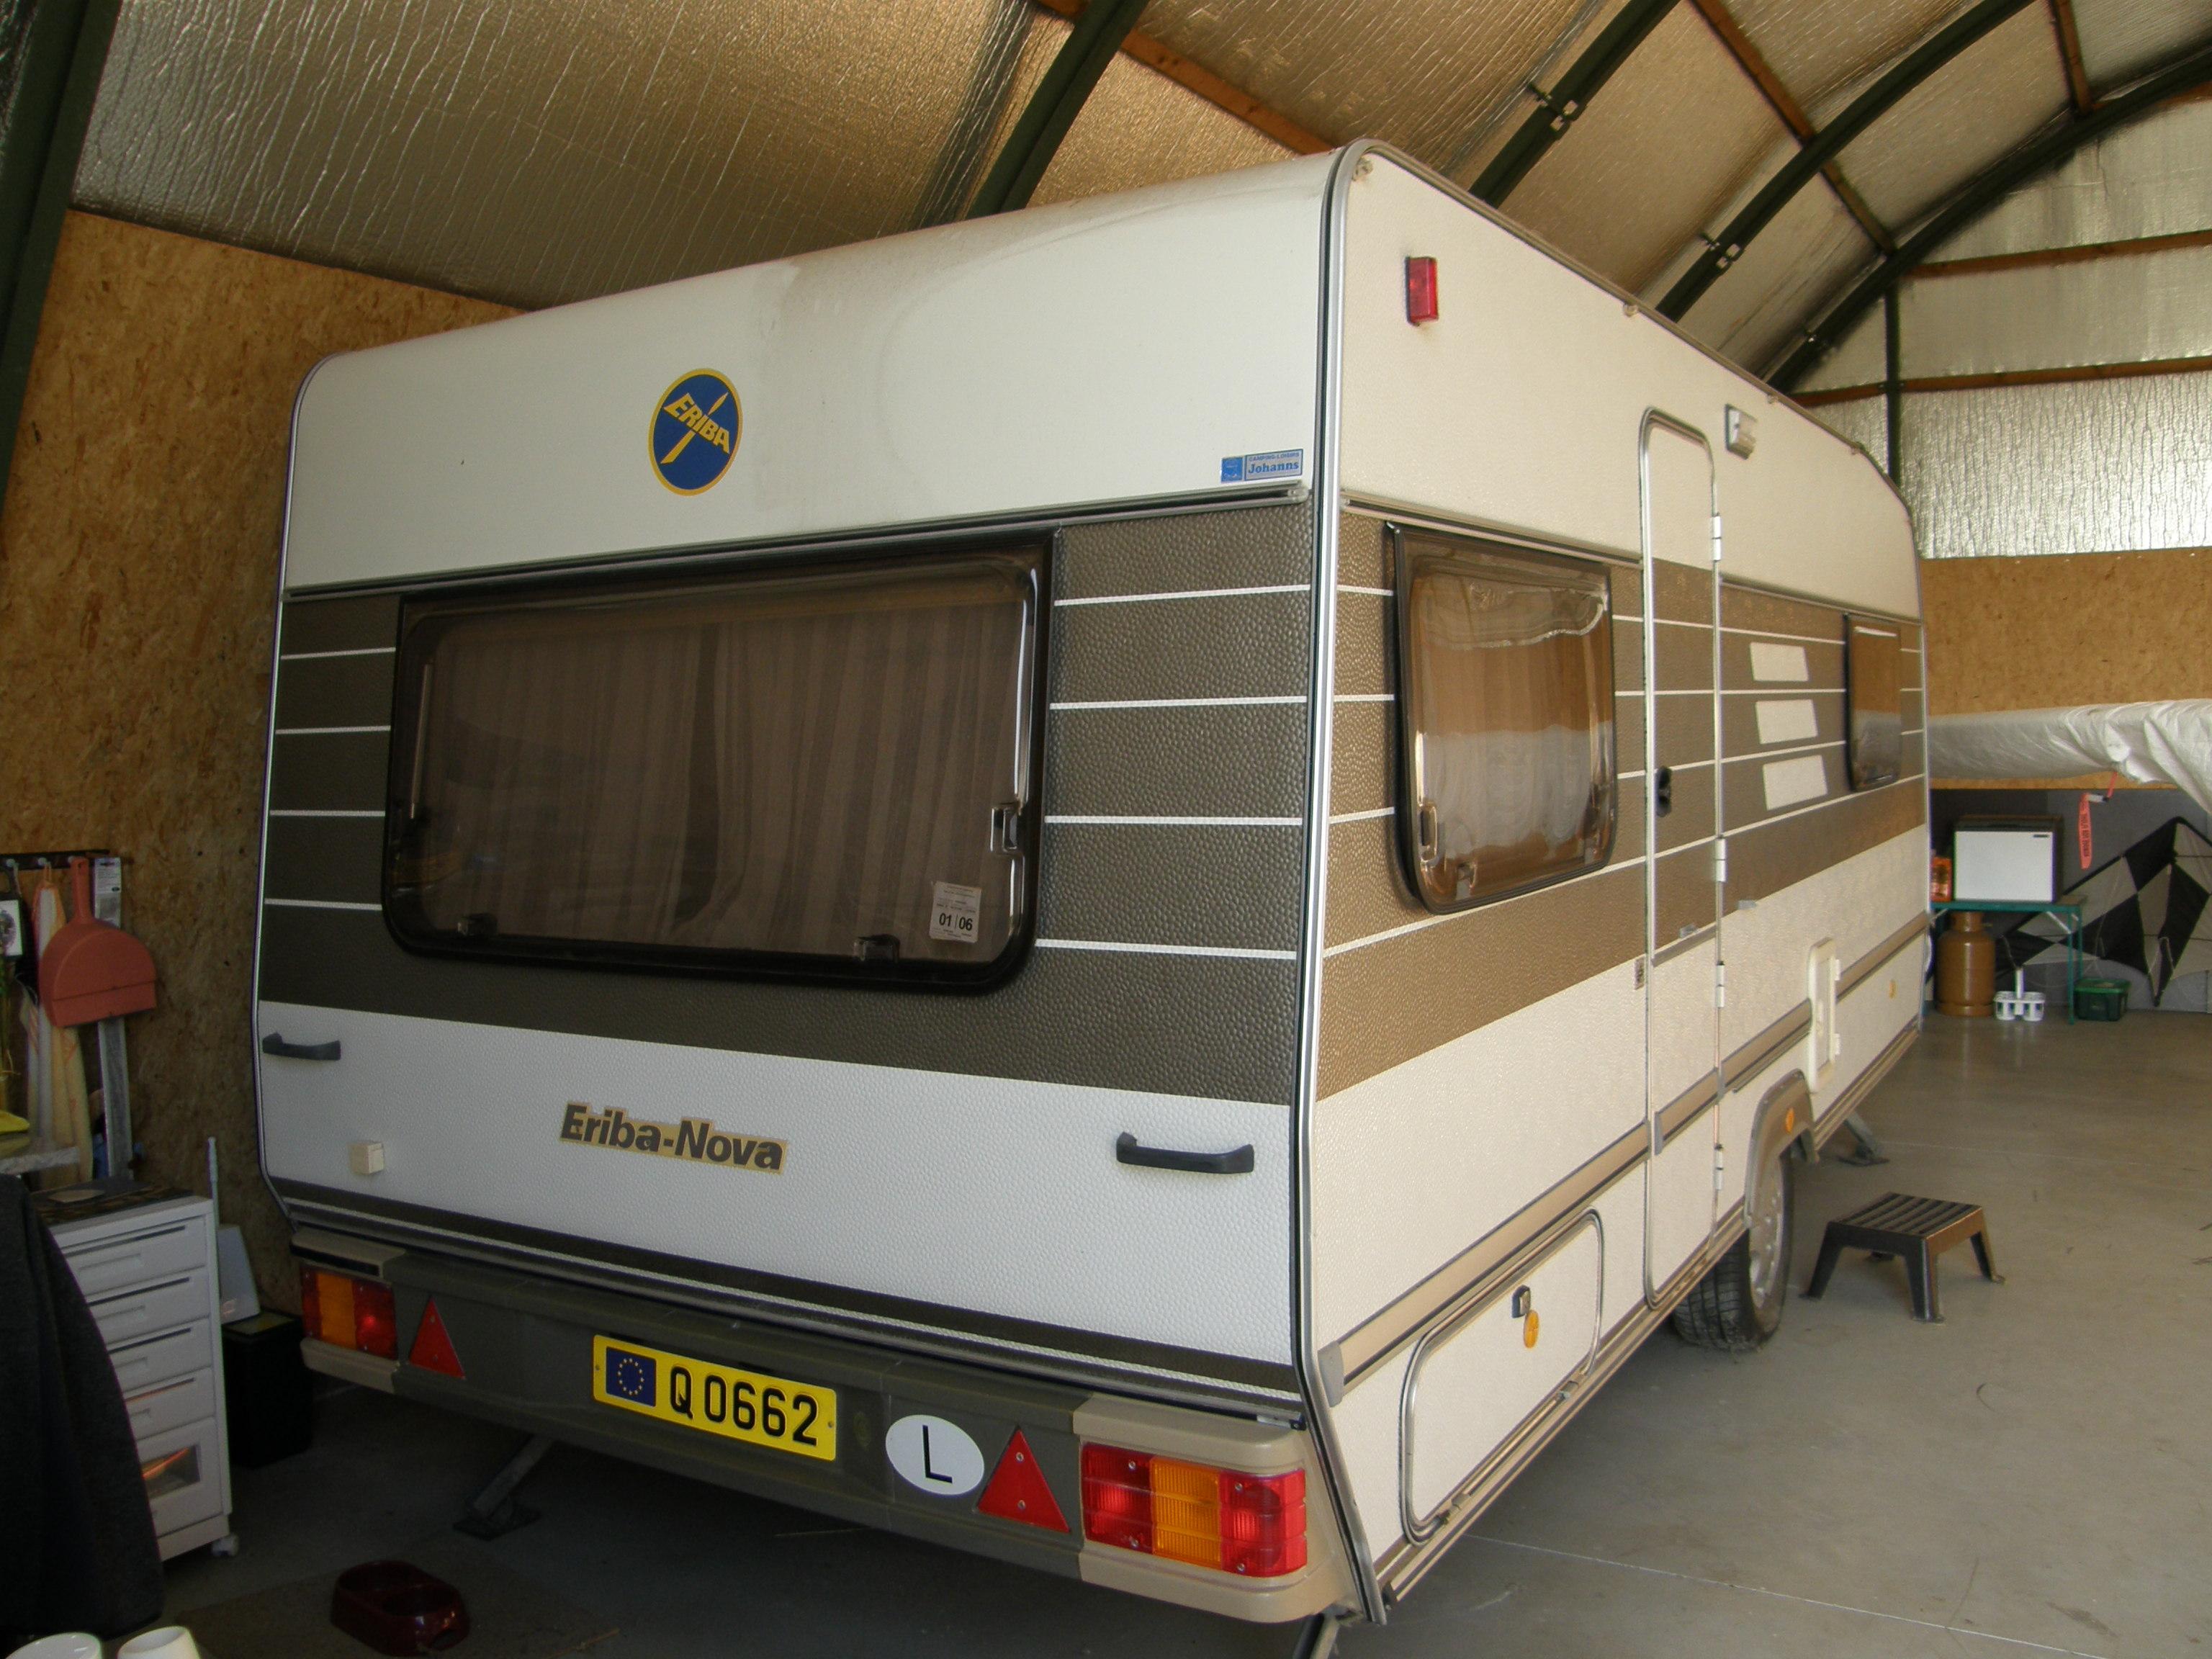 caravane eriba hymer vendre lf5422 39 s blog. Black Bedroom Furniture Sets. Home Design Ideas